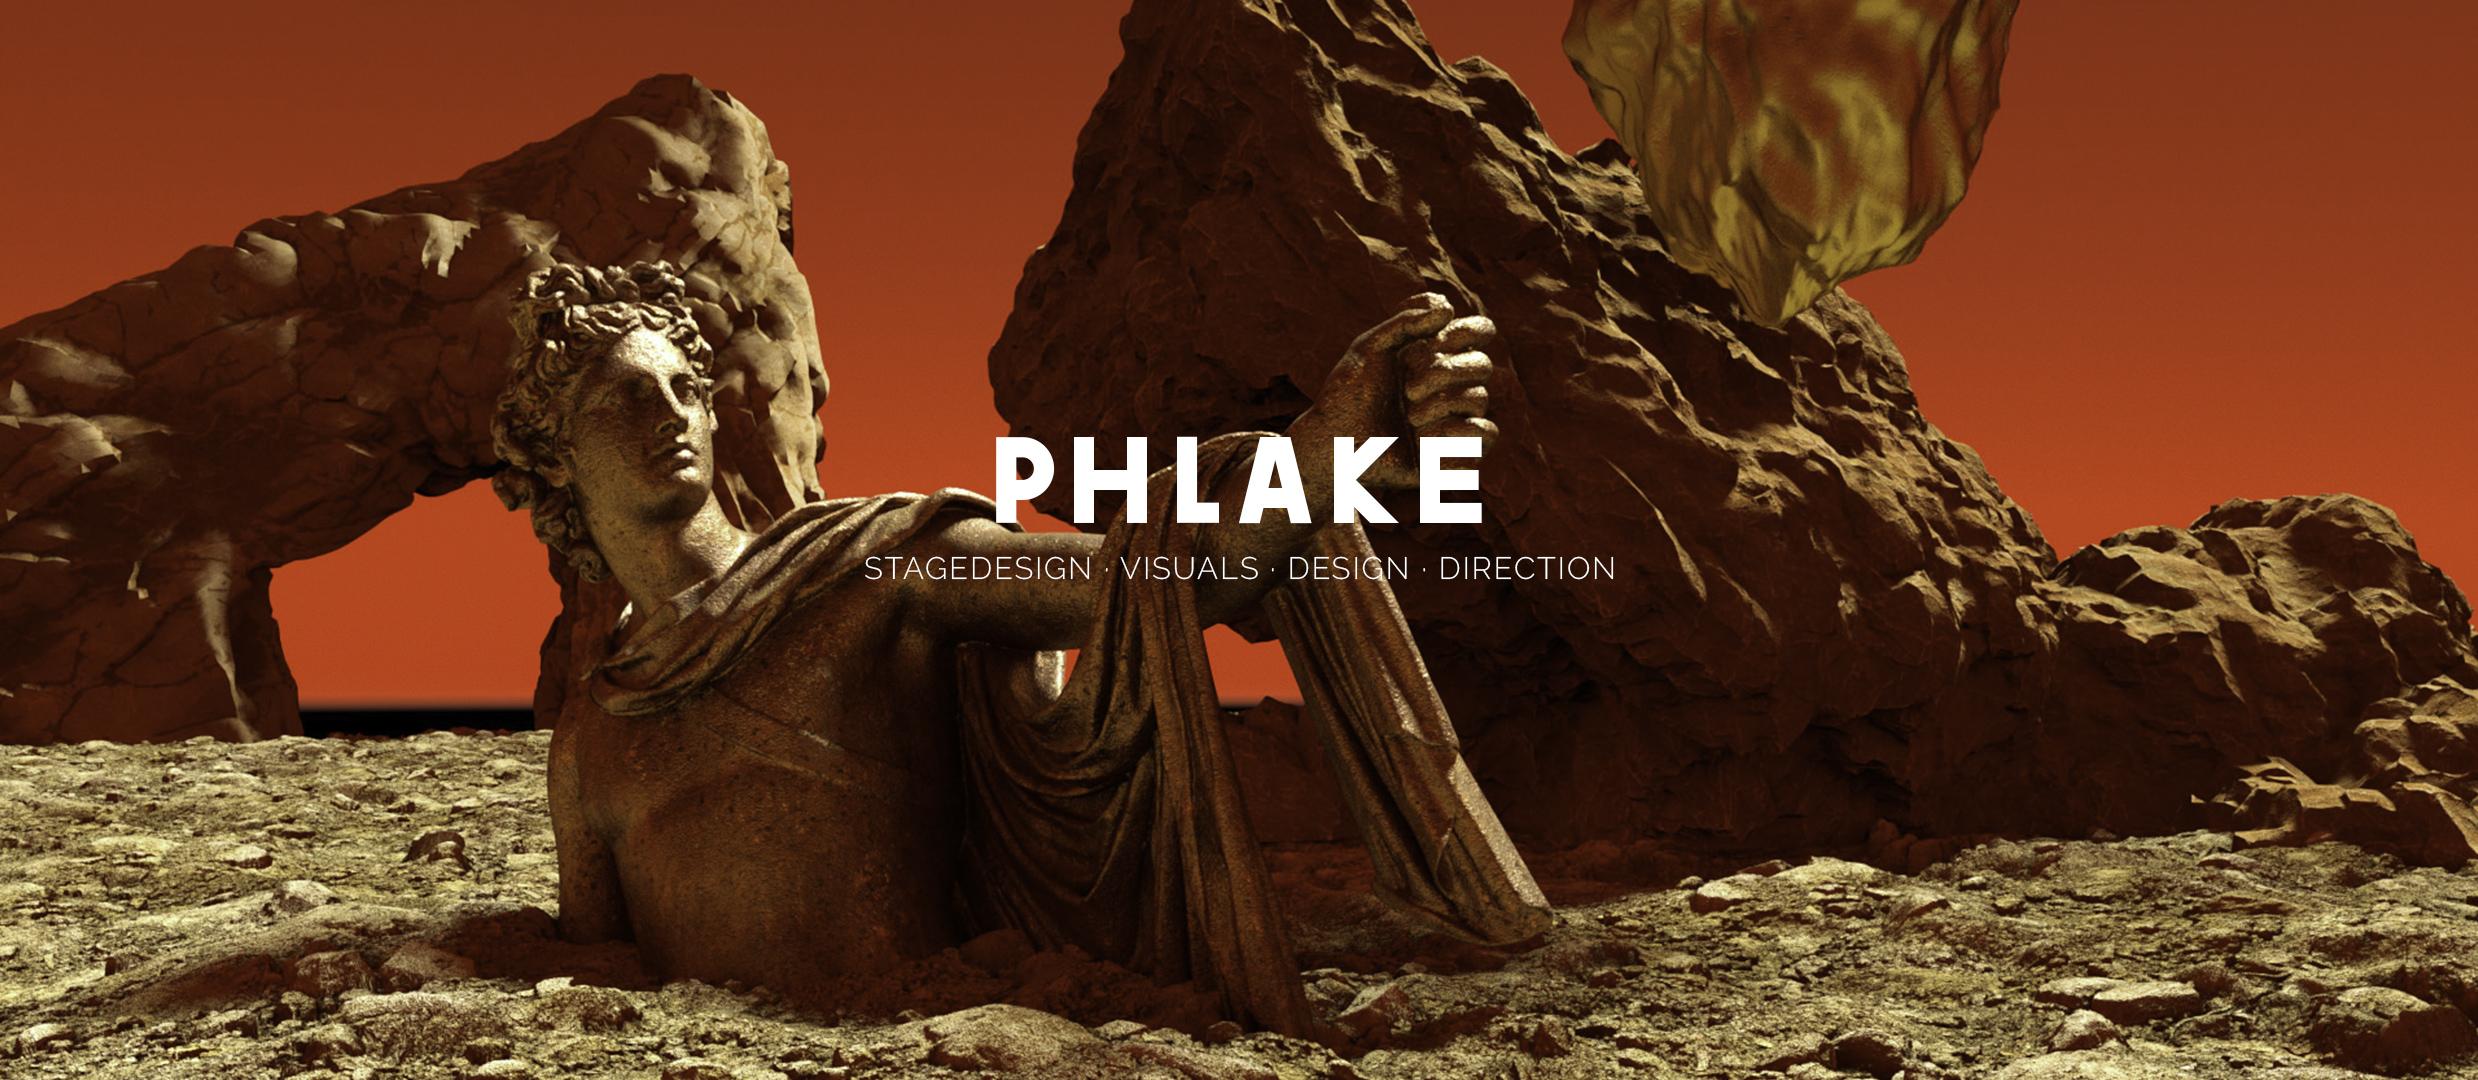 PHLAKE-cover